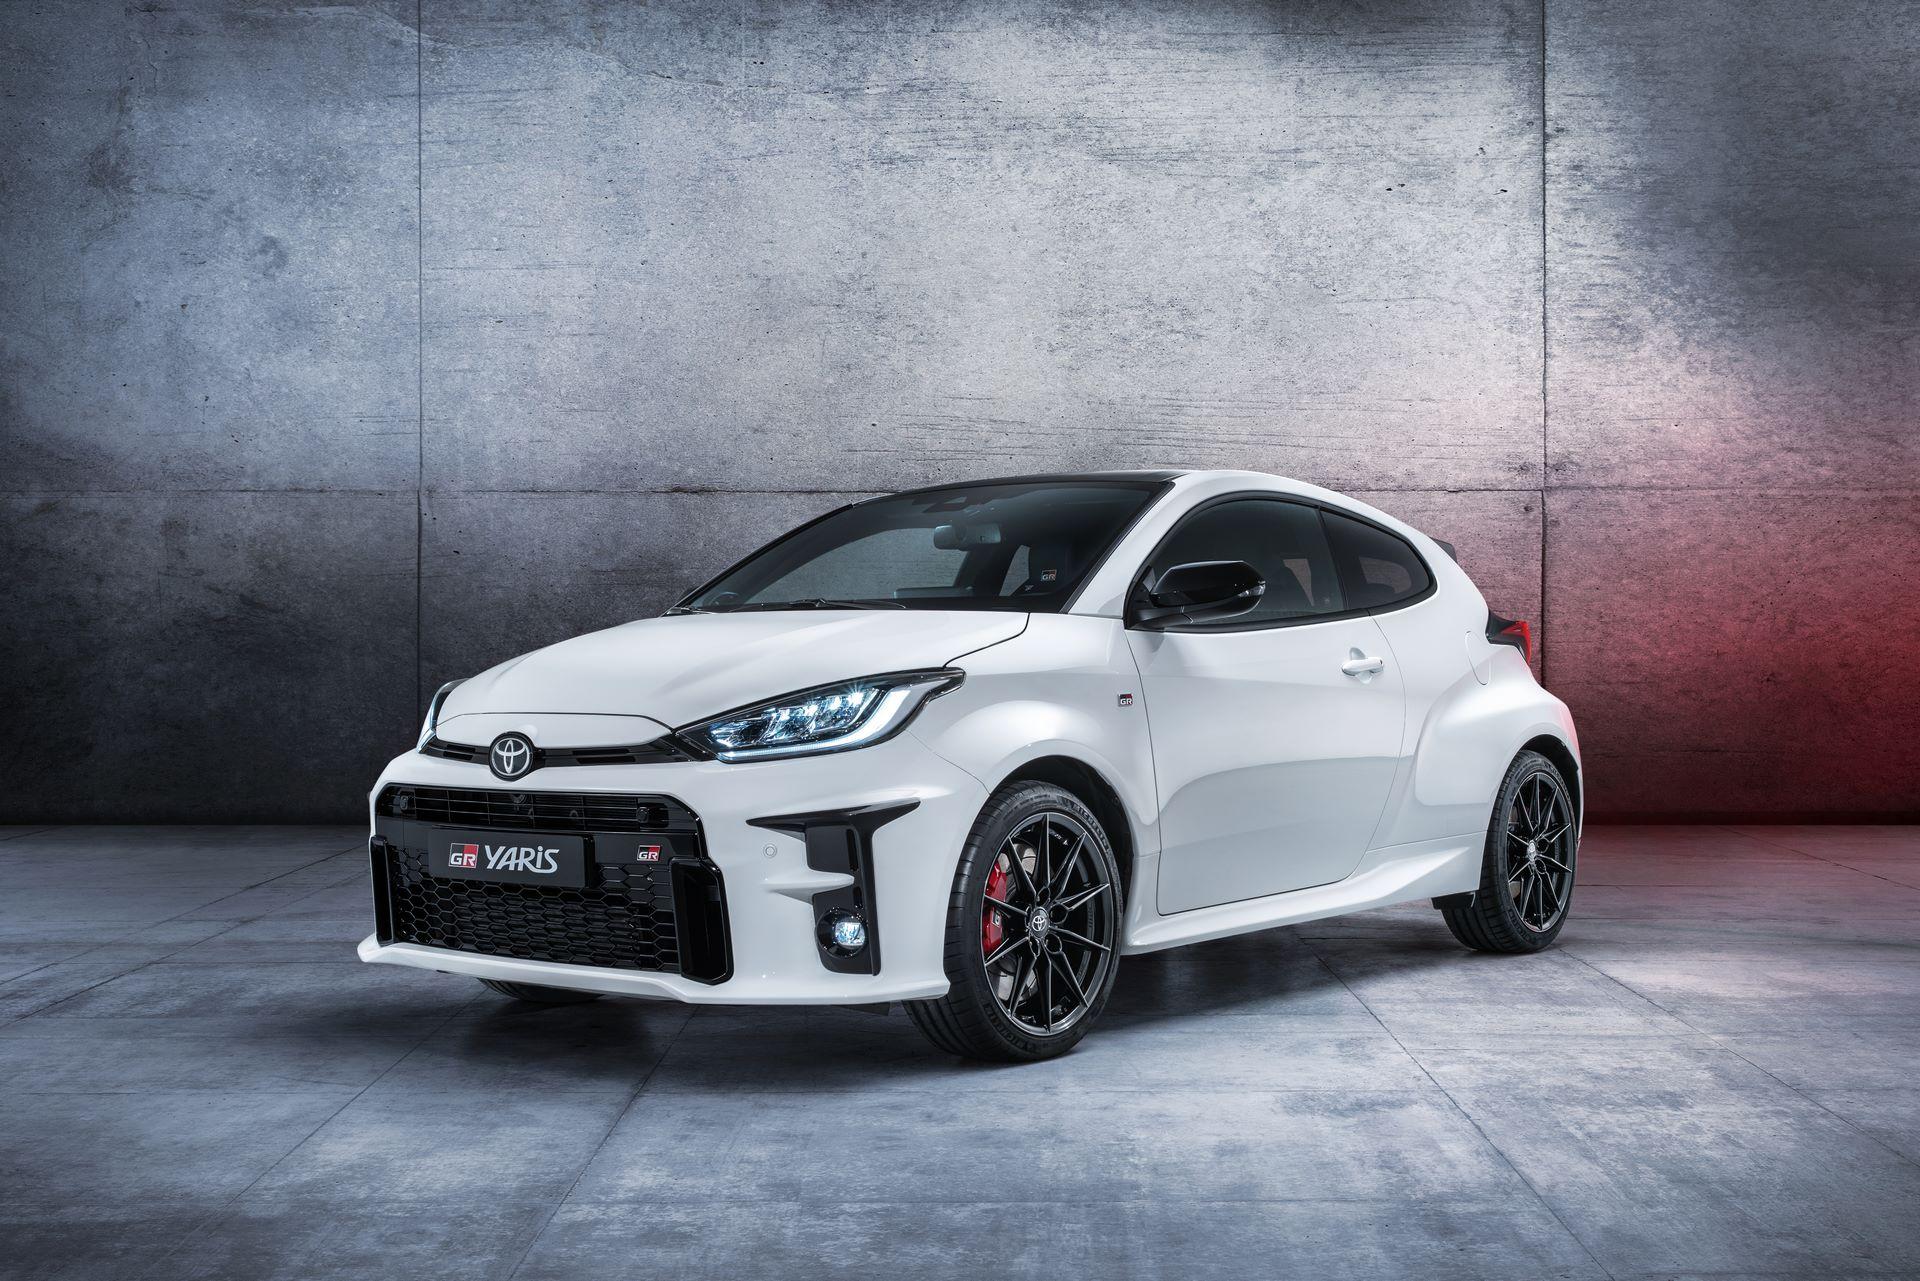 Toyota-GR-Yaris-2020-1